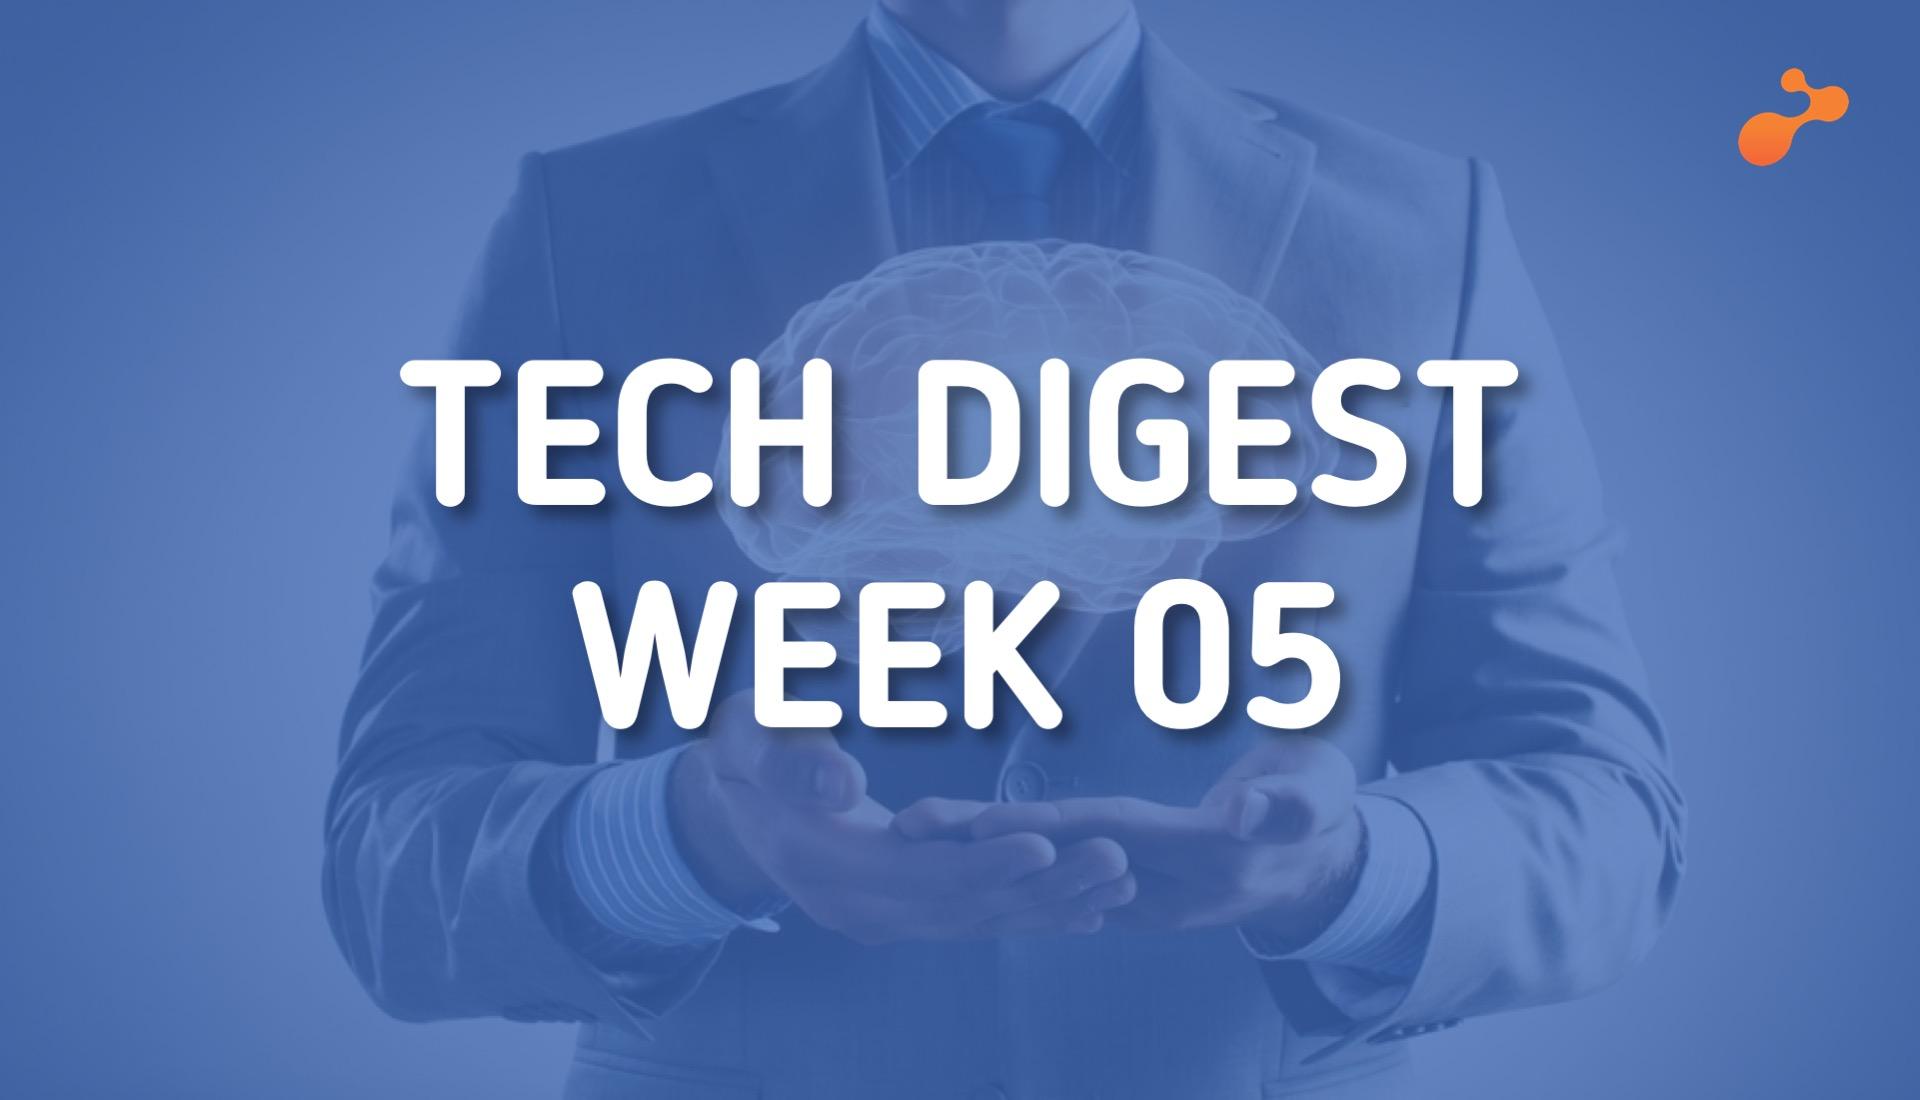 Technology news around the world - Week 05, 2019